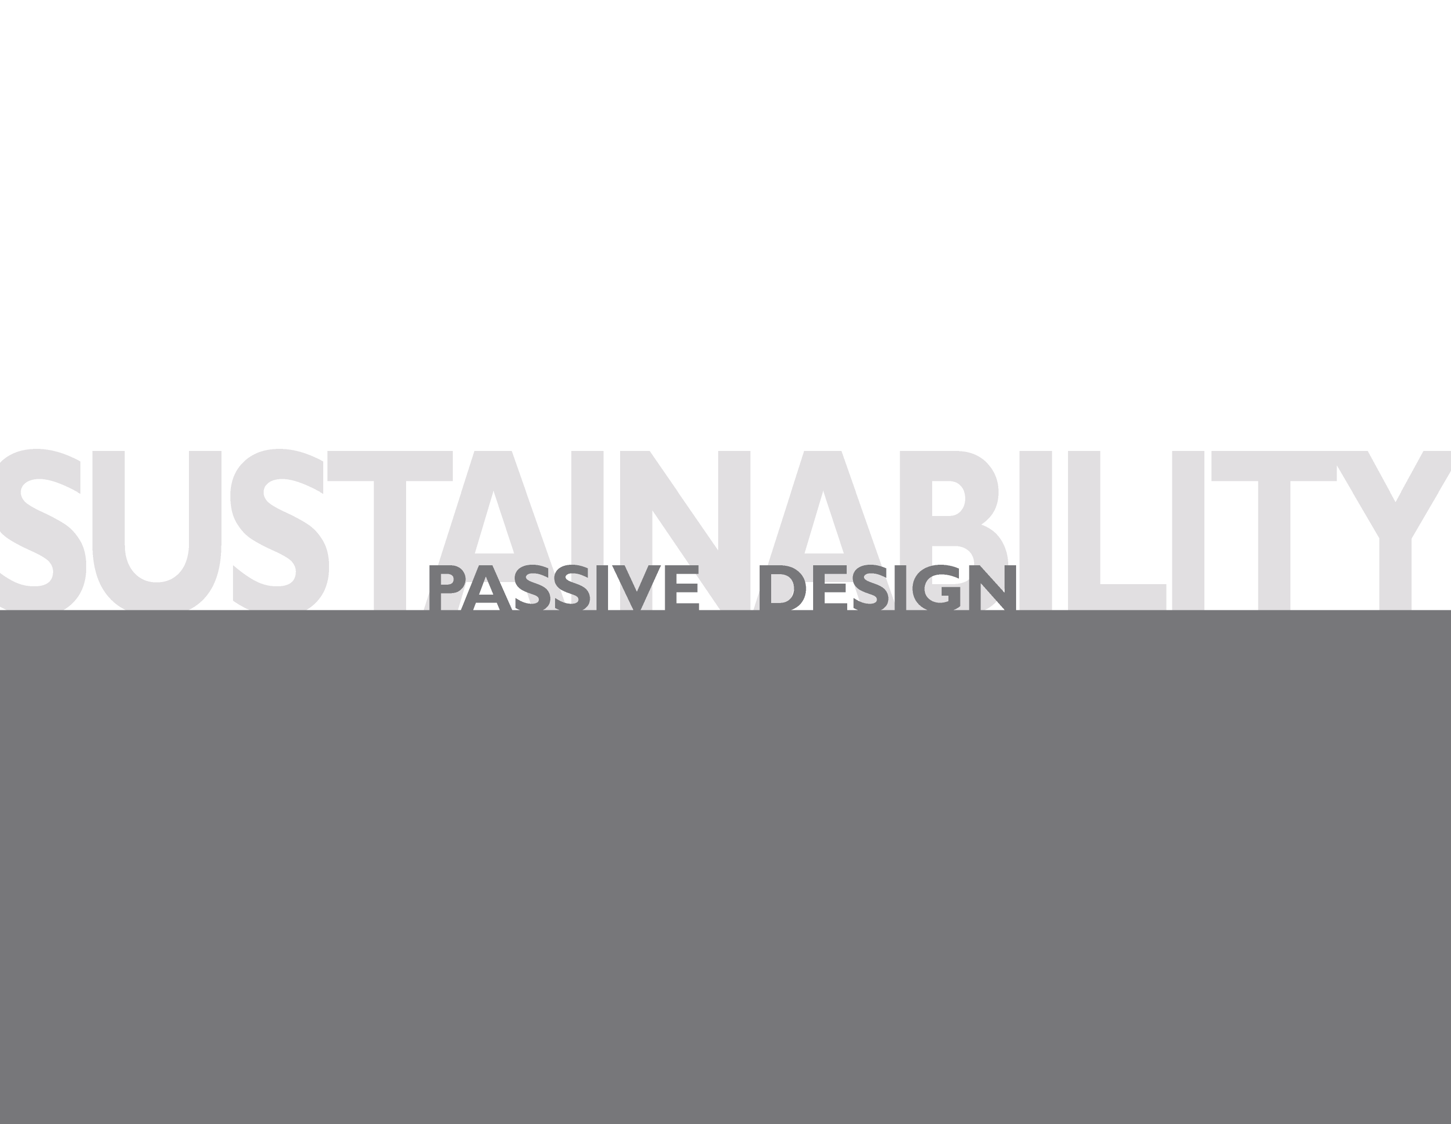 blog - SUSTAINABILITY Passive Design 02